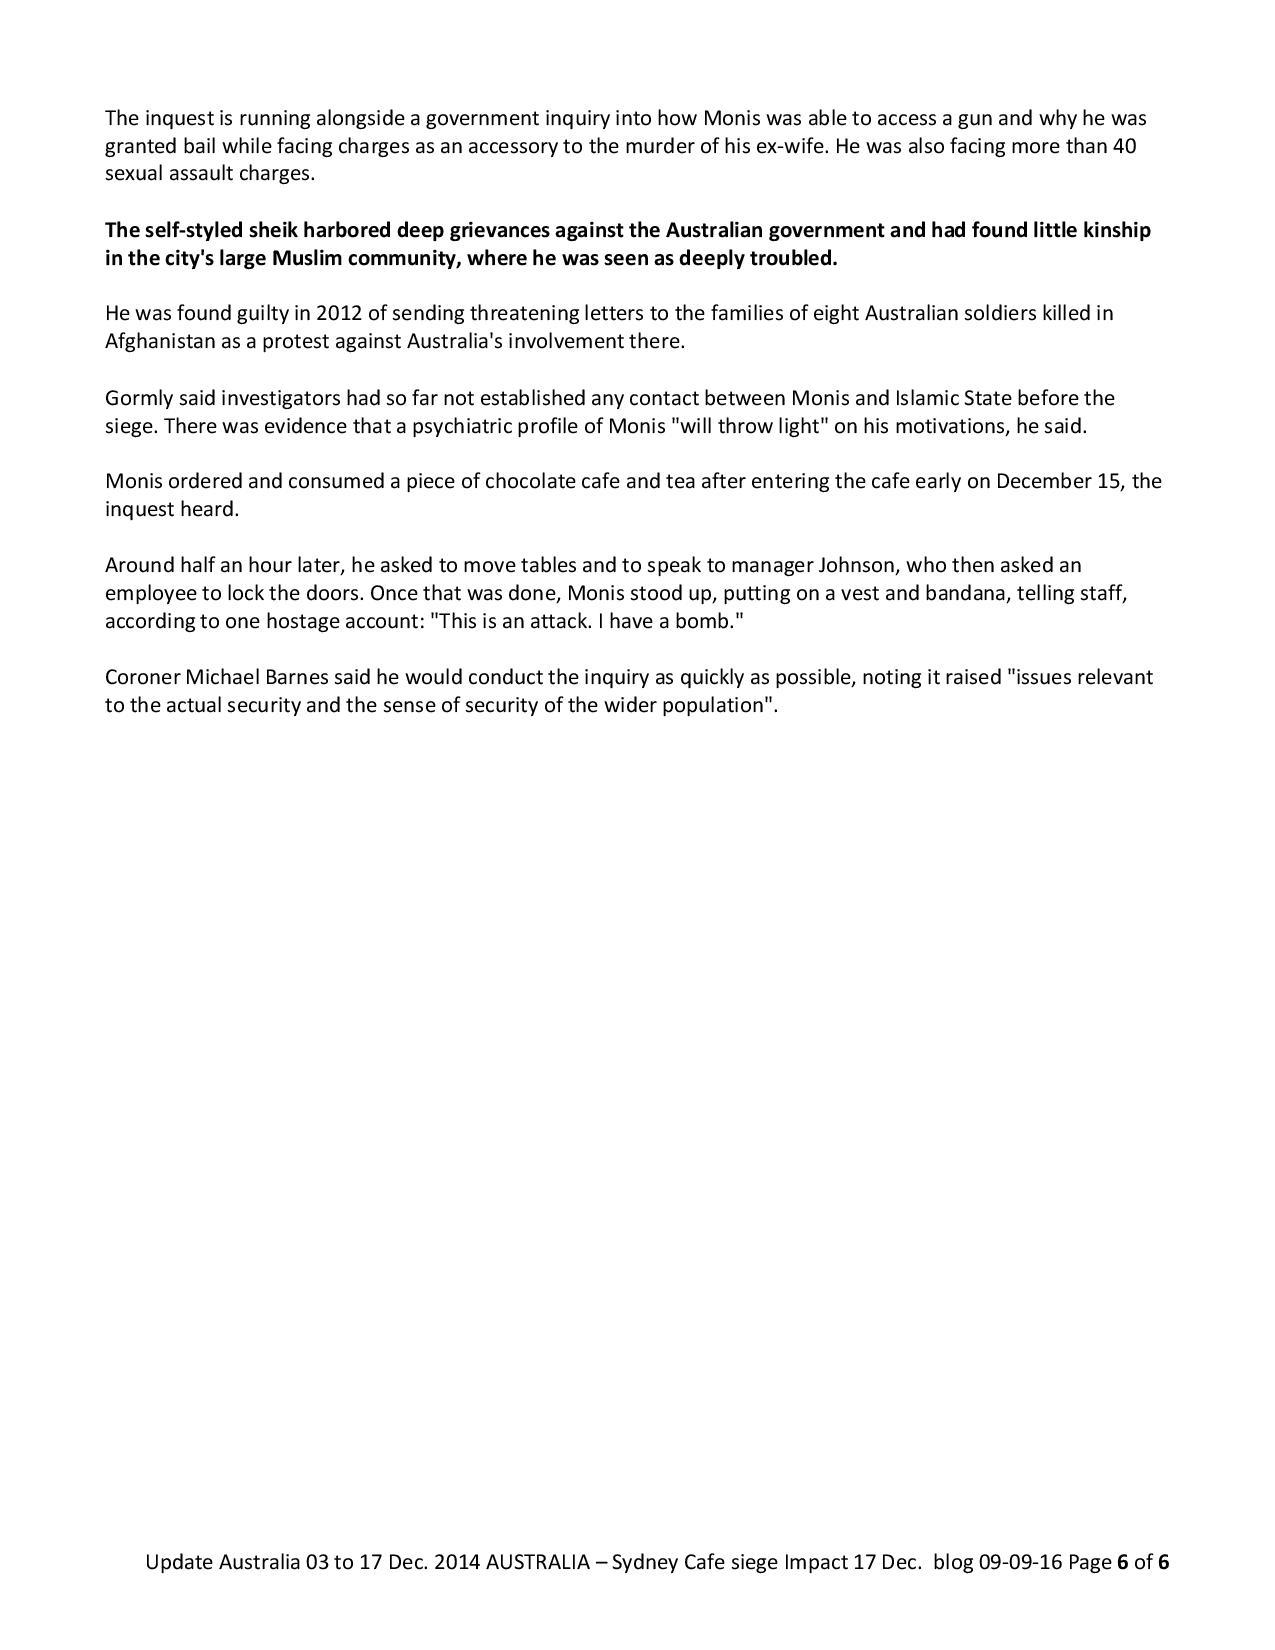 remote-viewing-australia-update-03-to-17-dec-2014-p6-sydney-cafe-siege-impact-date-17-dec-2014